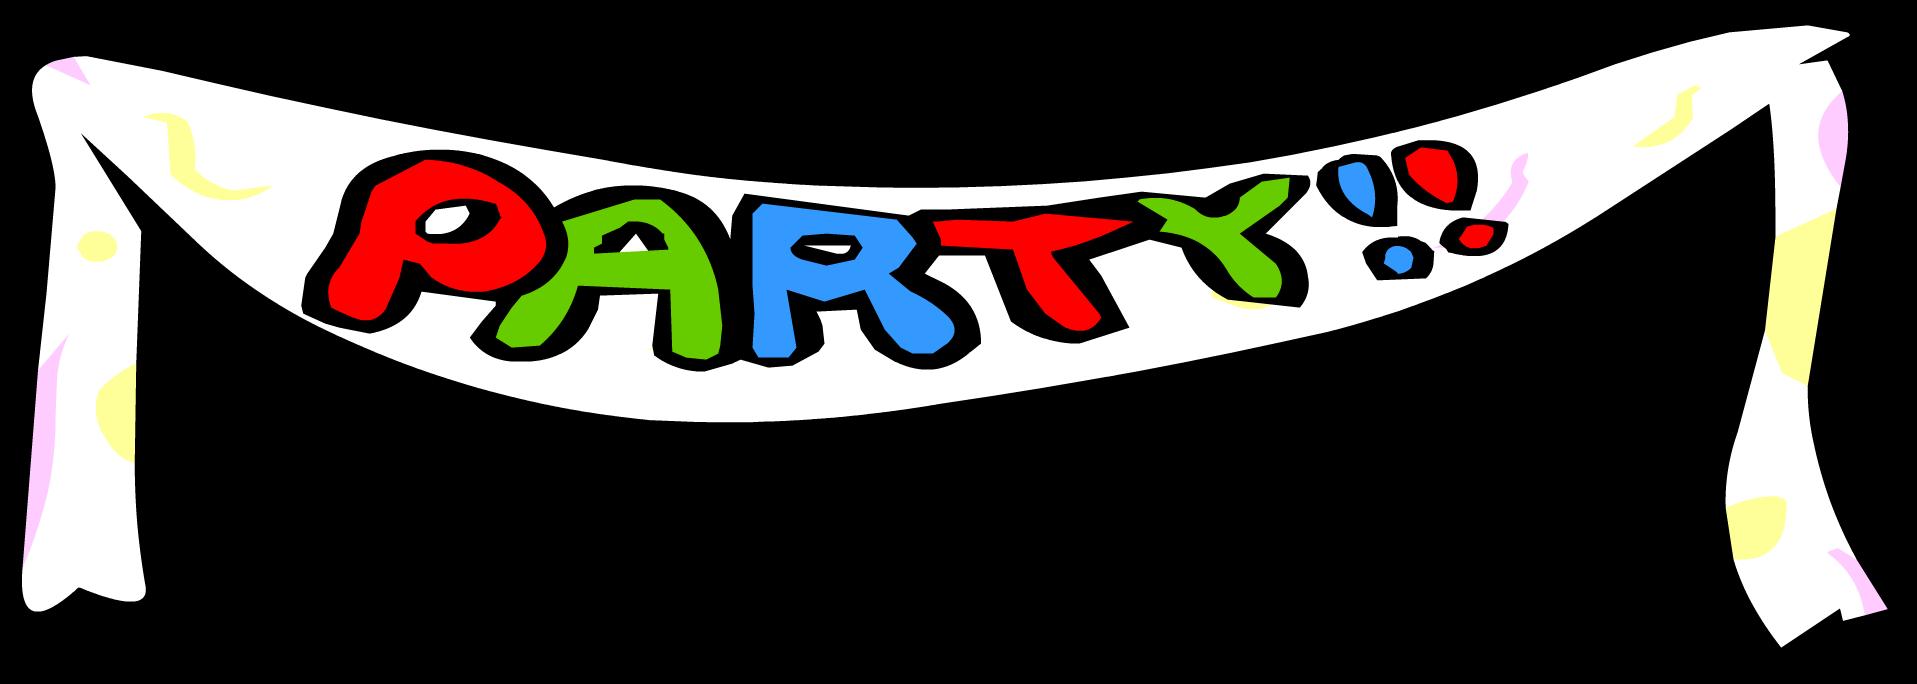 Party clipart party banner. Club penguin wiki fandom